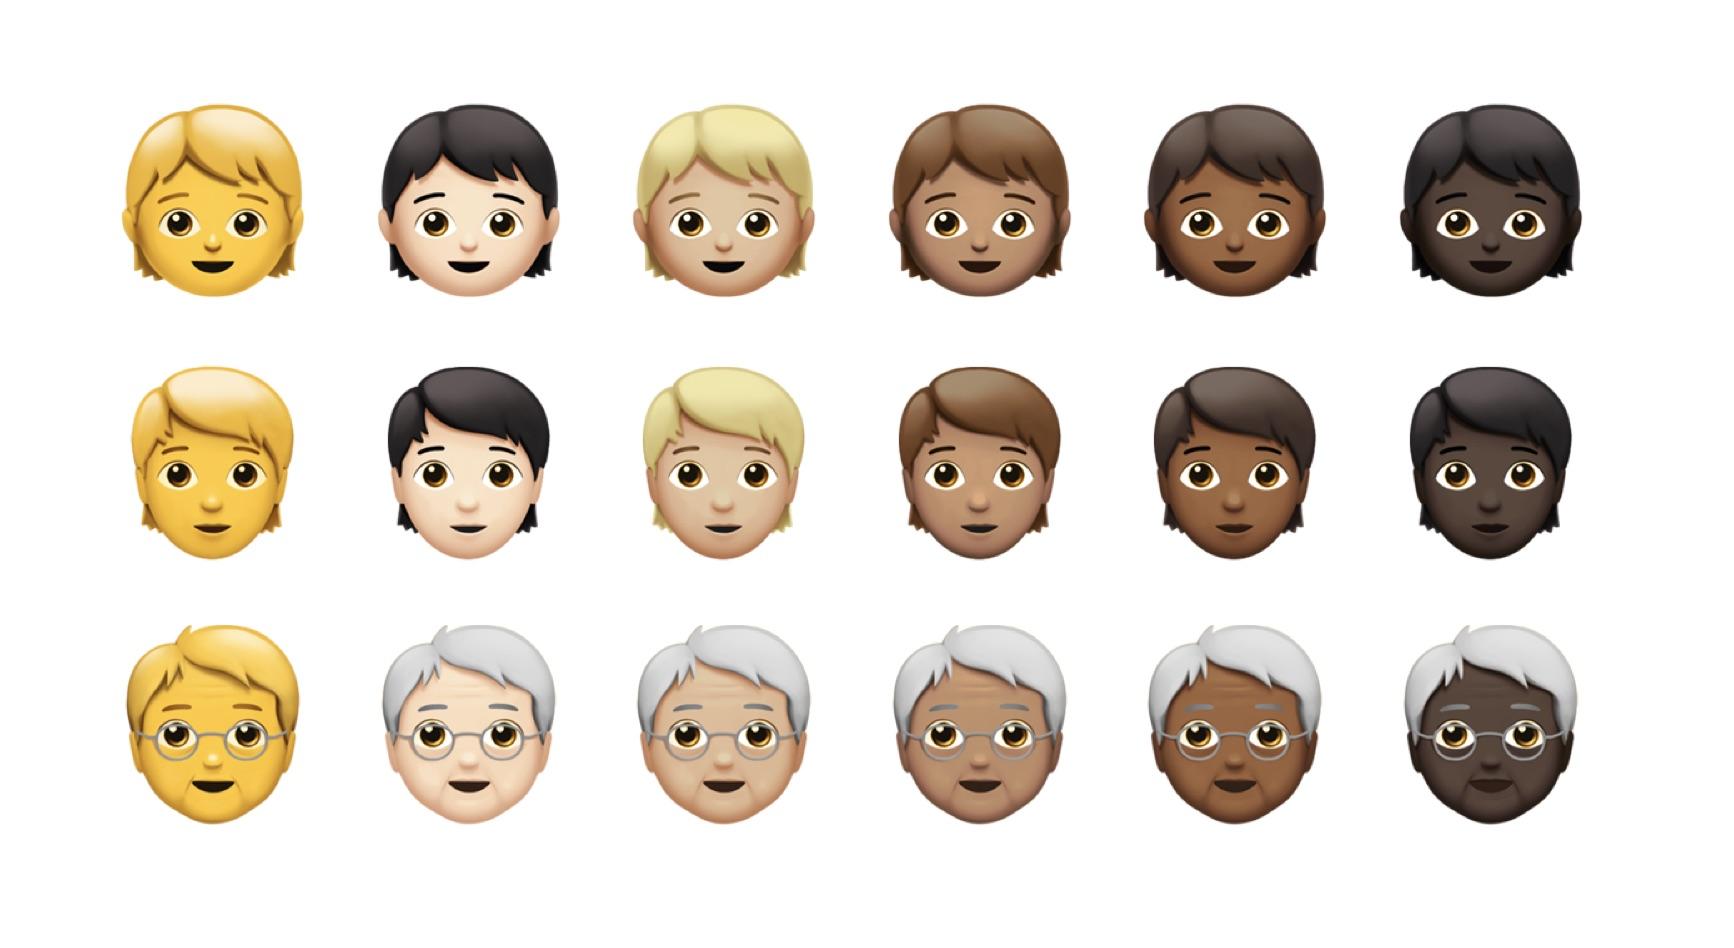 gender-inclusive-emojis-ios-11-1-emojipedia